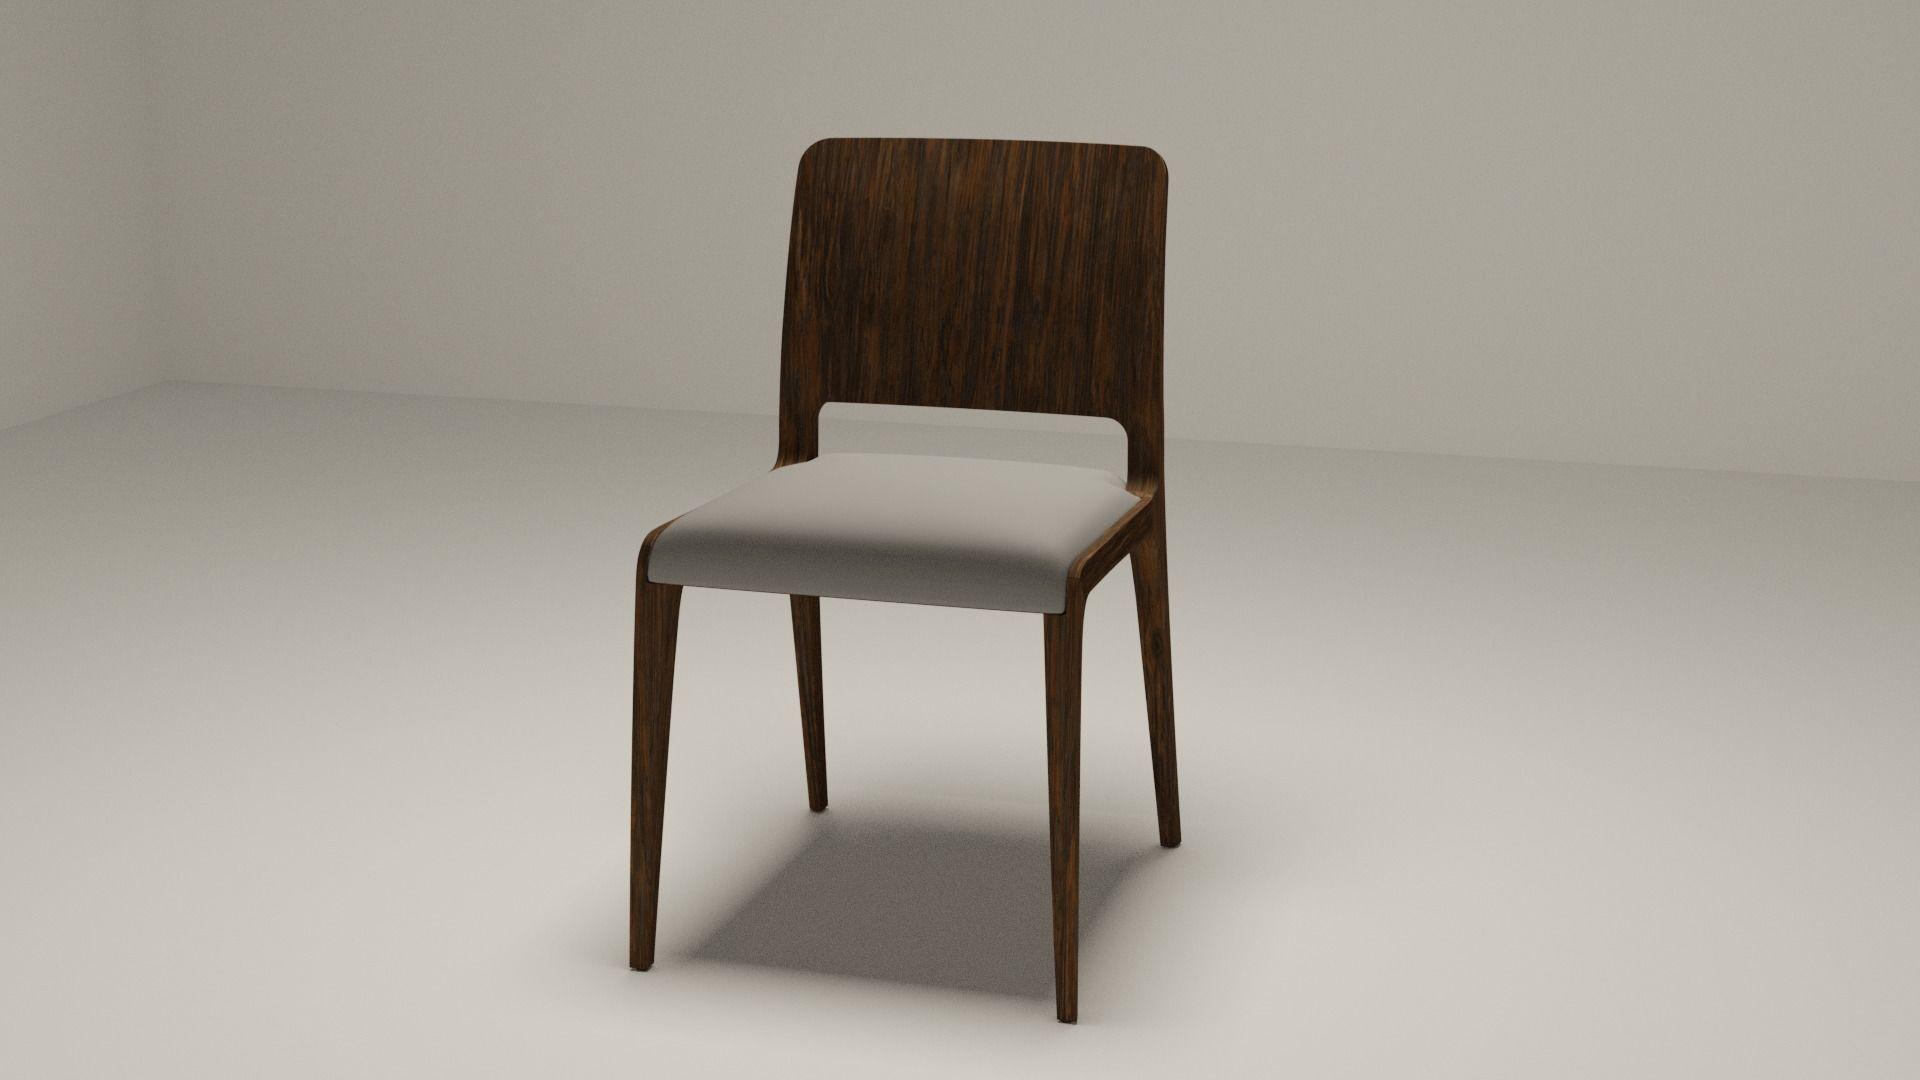 Modern Minimalist Wooden Chair 3d Model Cgtrader